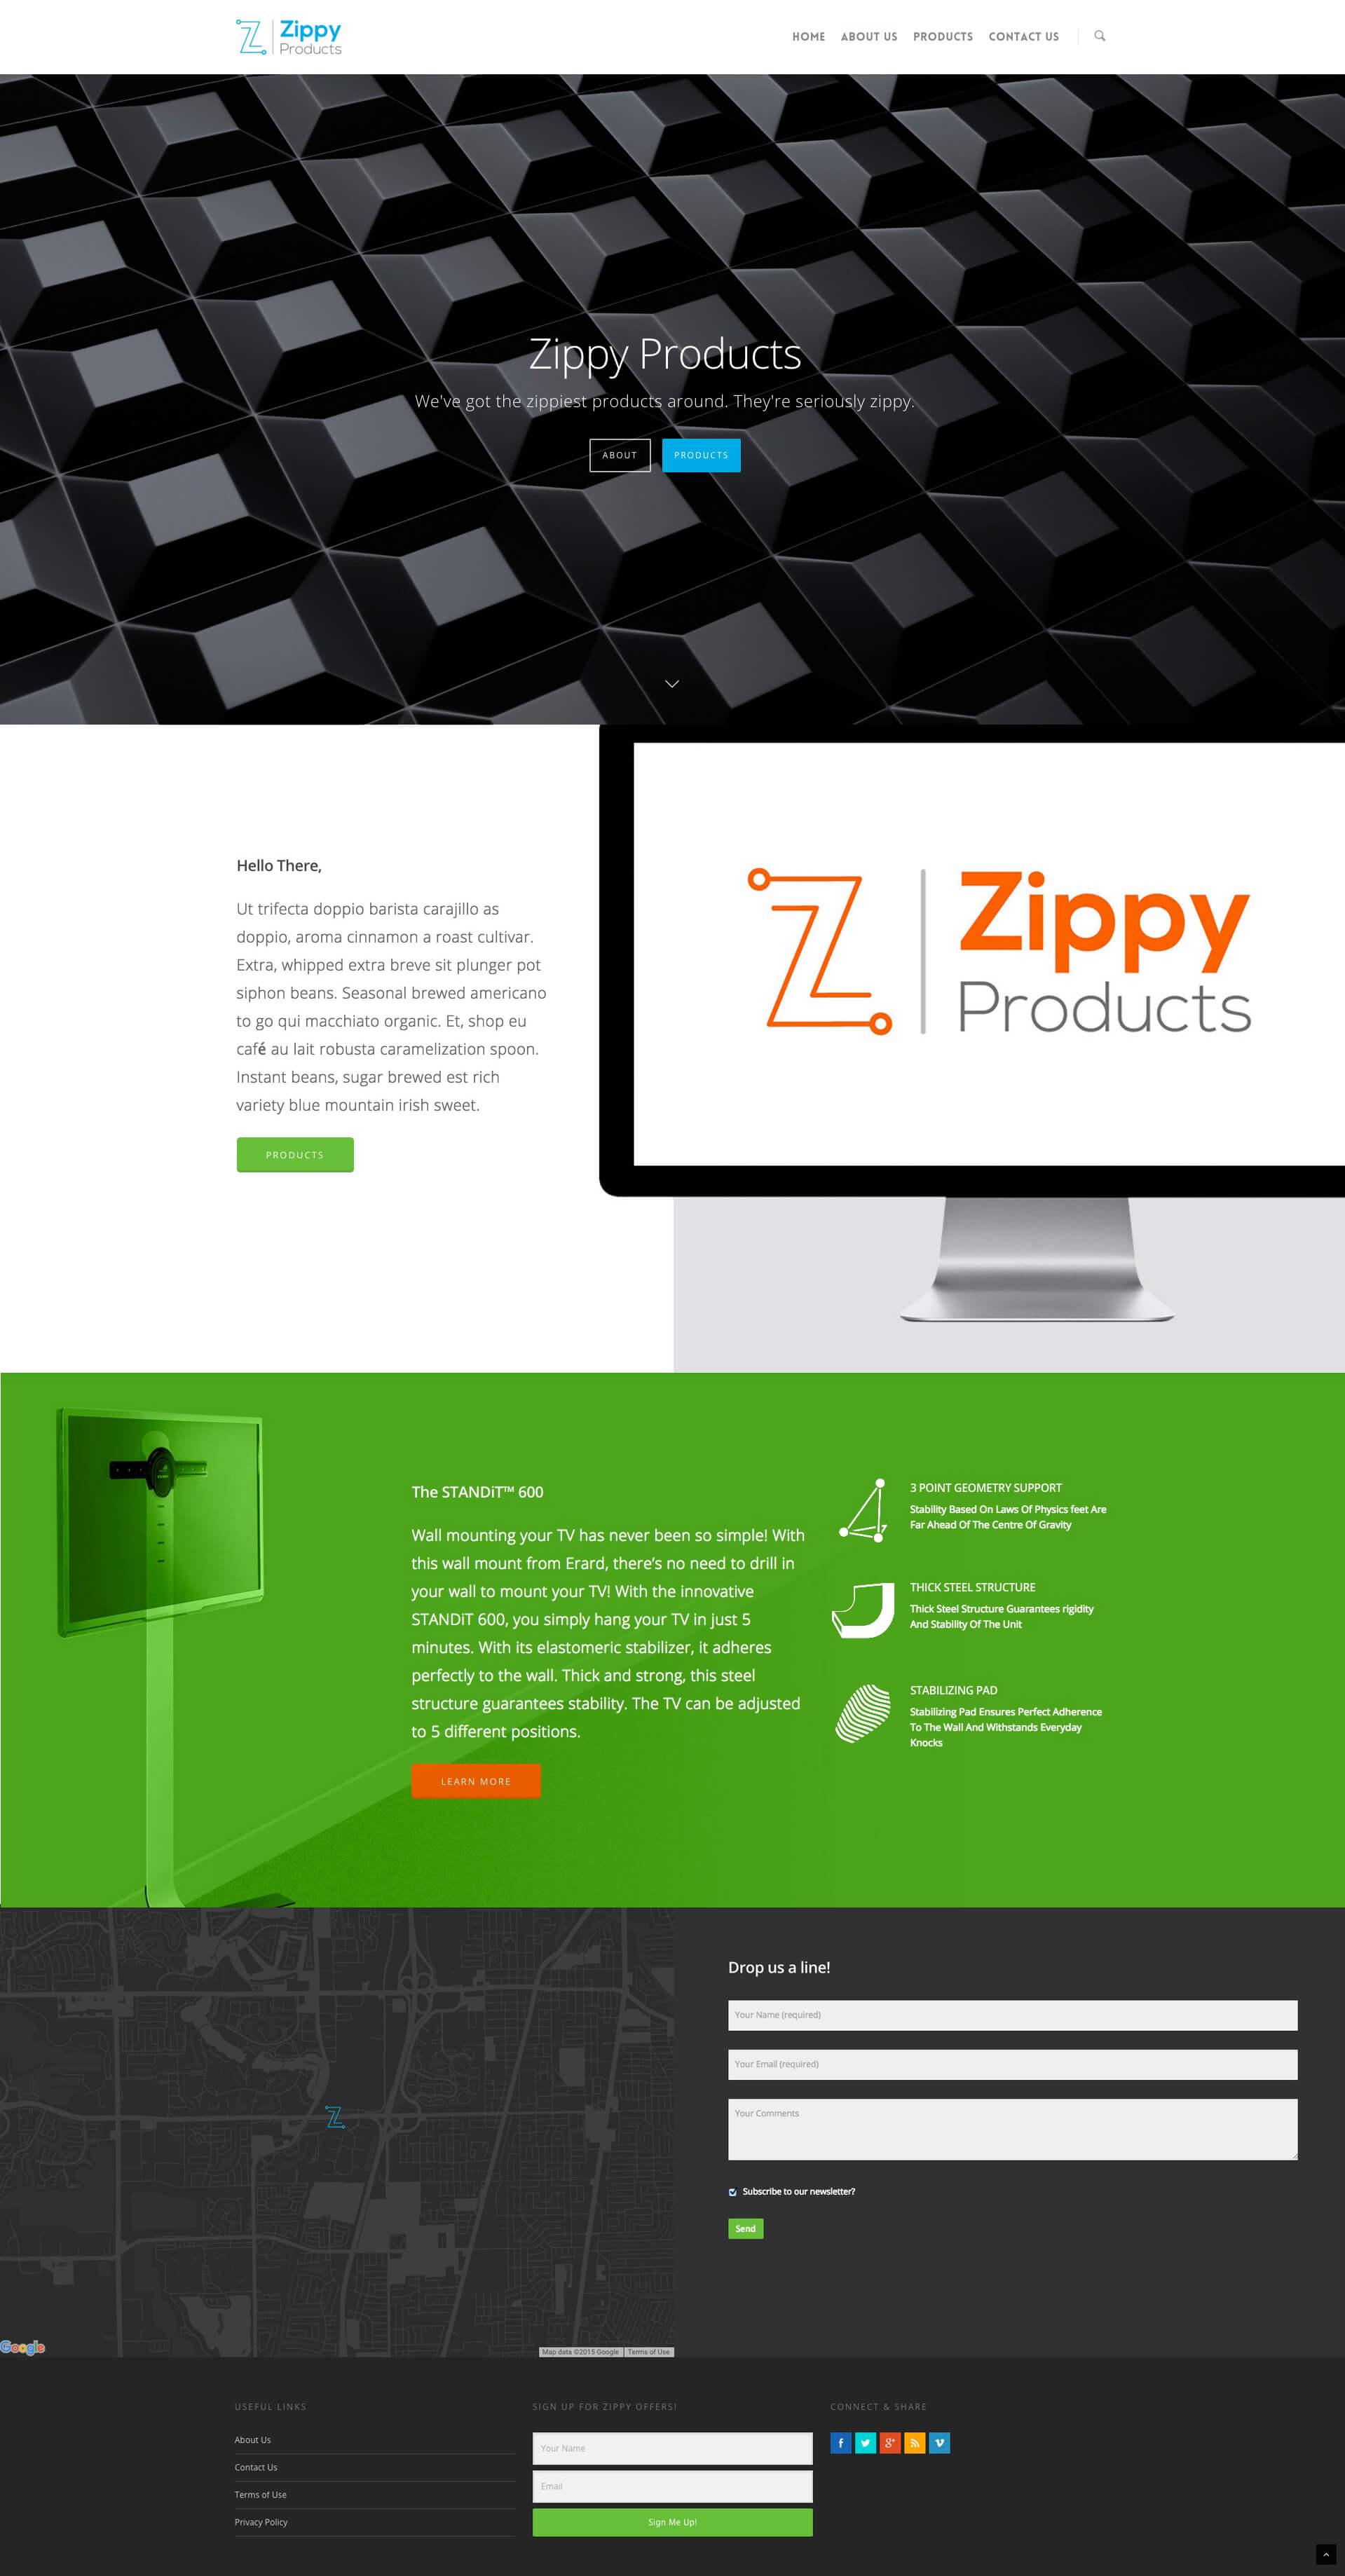 Zippy Products Website design